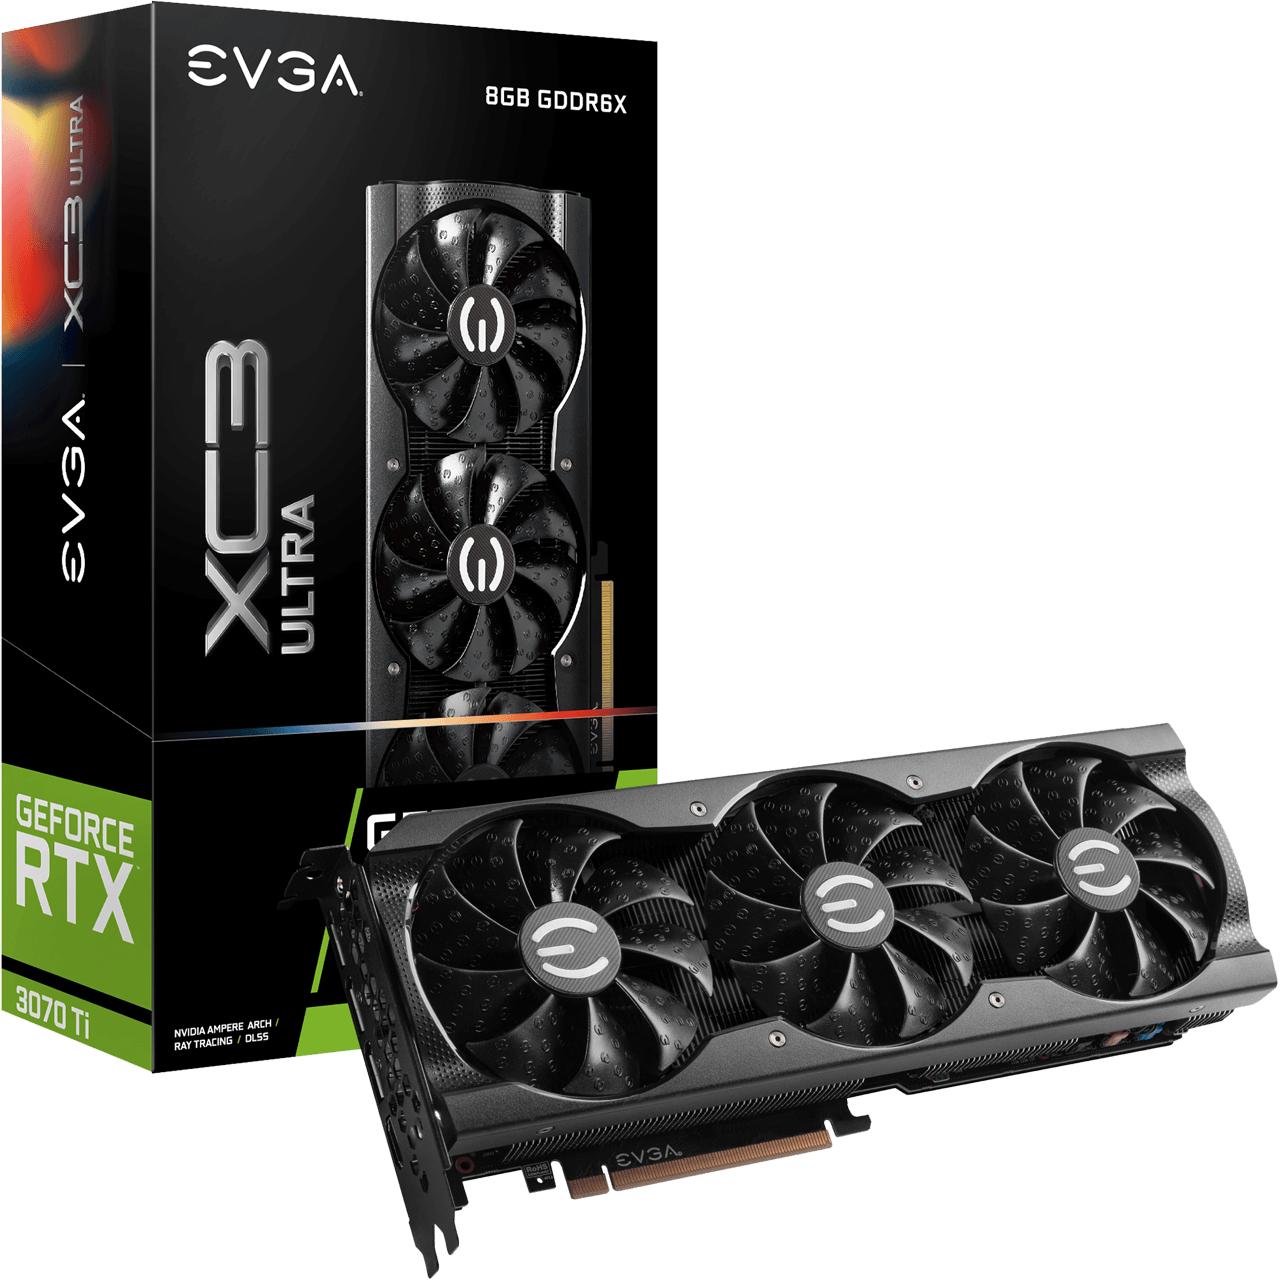 EVGA GeForce RTX3070 Ti XC3 Ultra 8 GB GDDR6X Retail